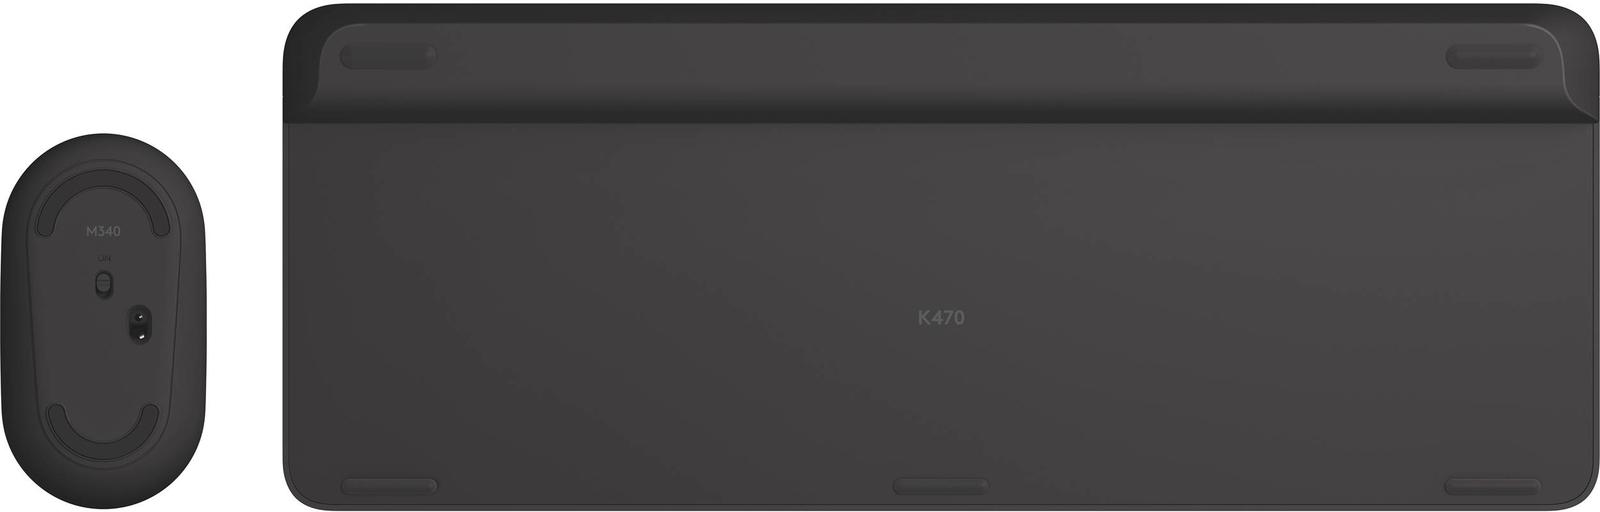 Logitech MK470 Slim Wireless Keyboard and Mouse Combo - Black image